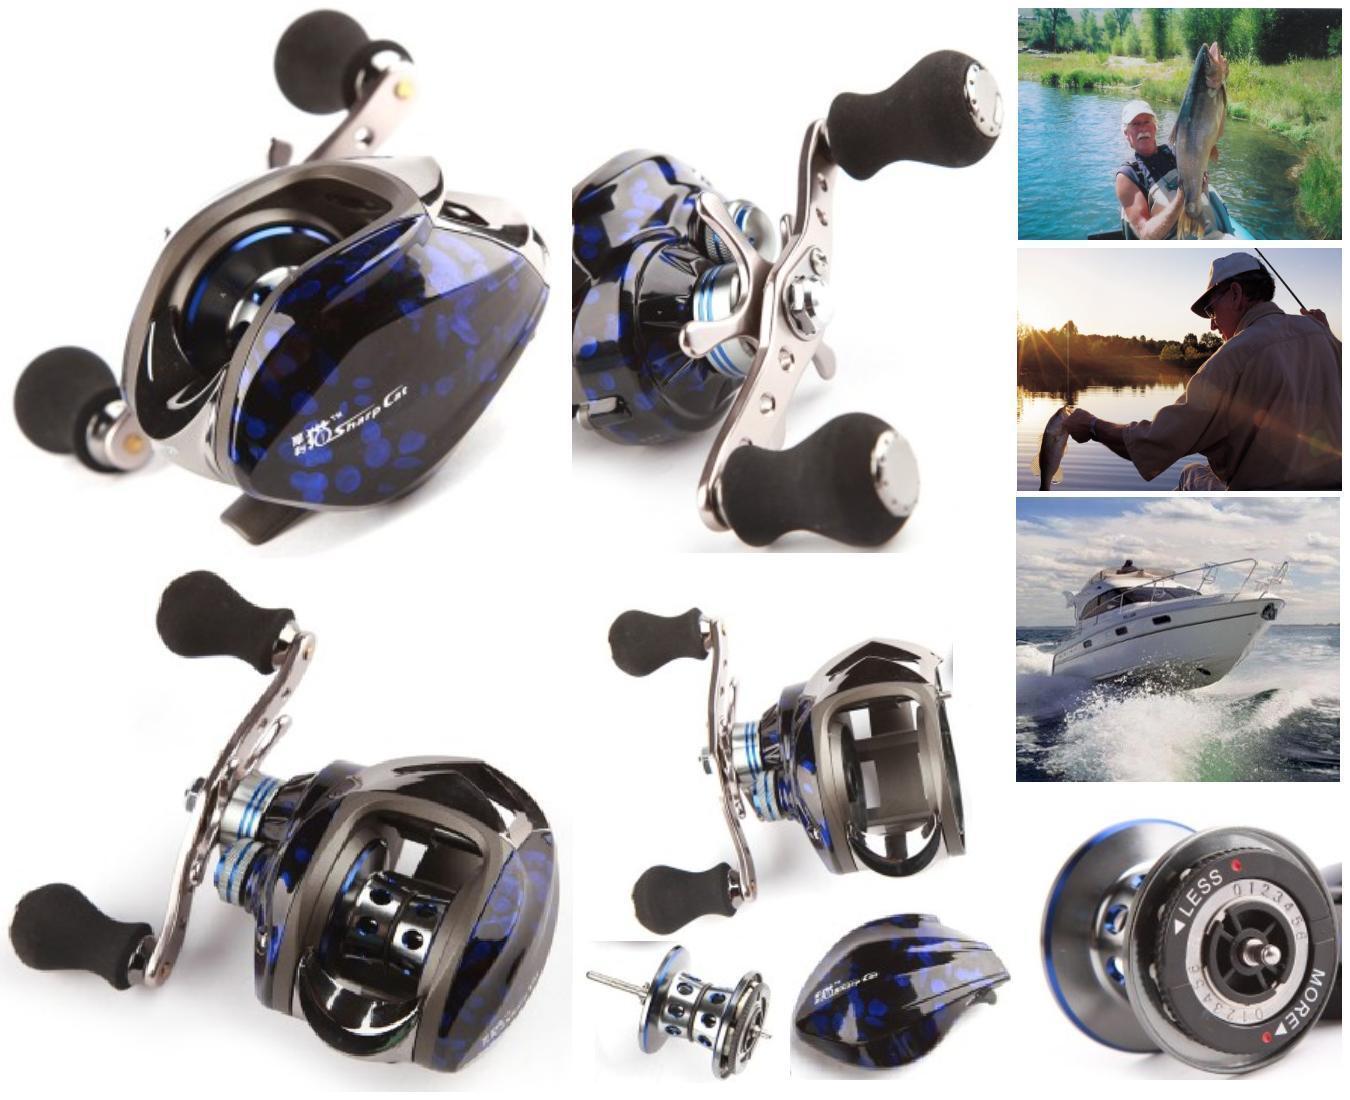 Fishing reel SPINNING Gr.217 REPORT 6.3 1 BRAKE MAGNETIC 10 BEARINGS